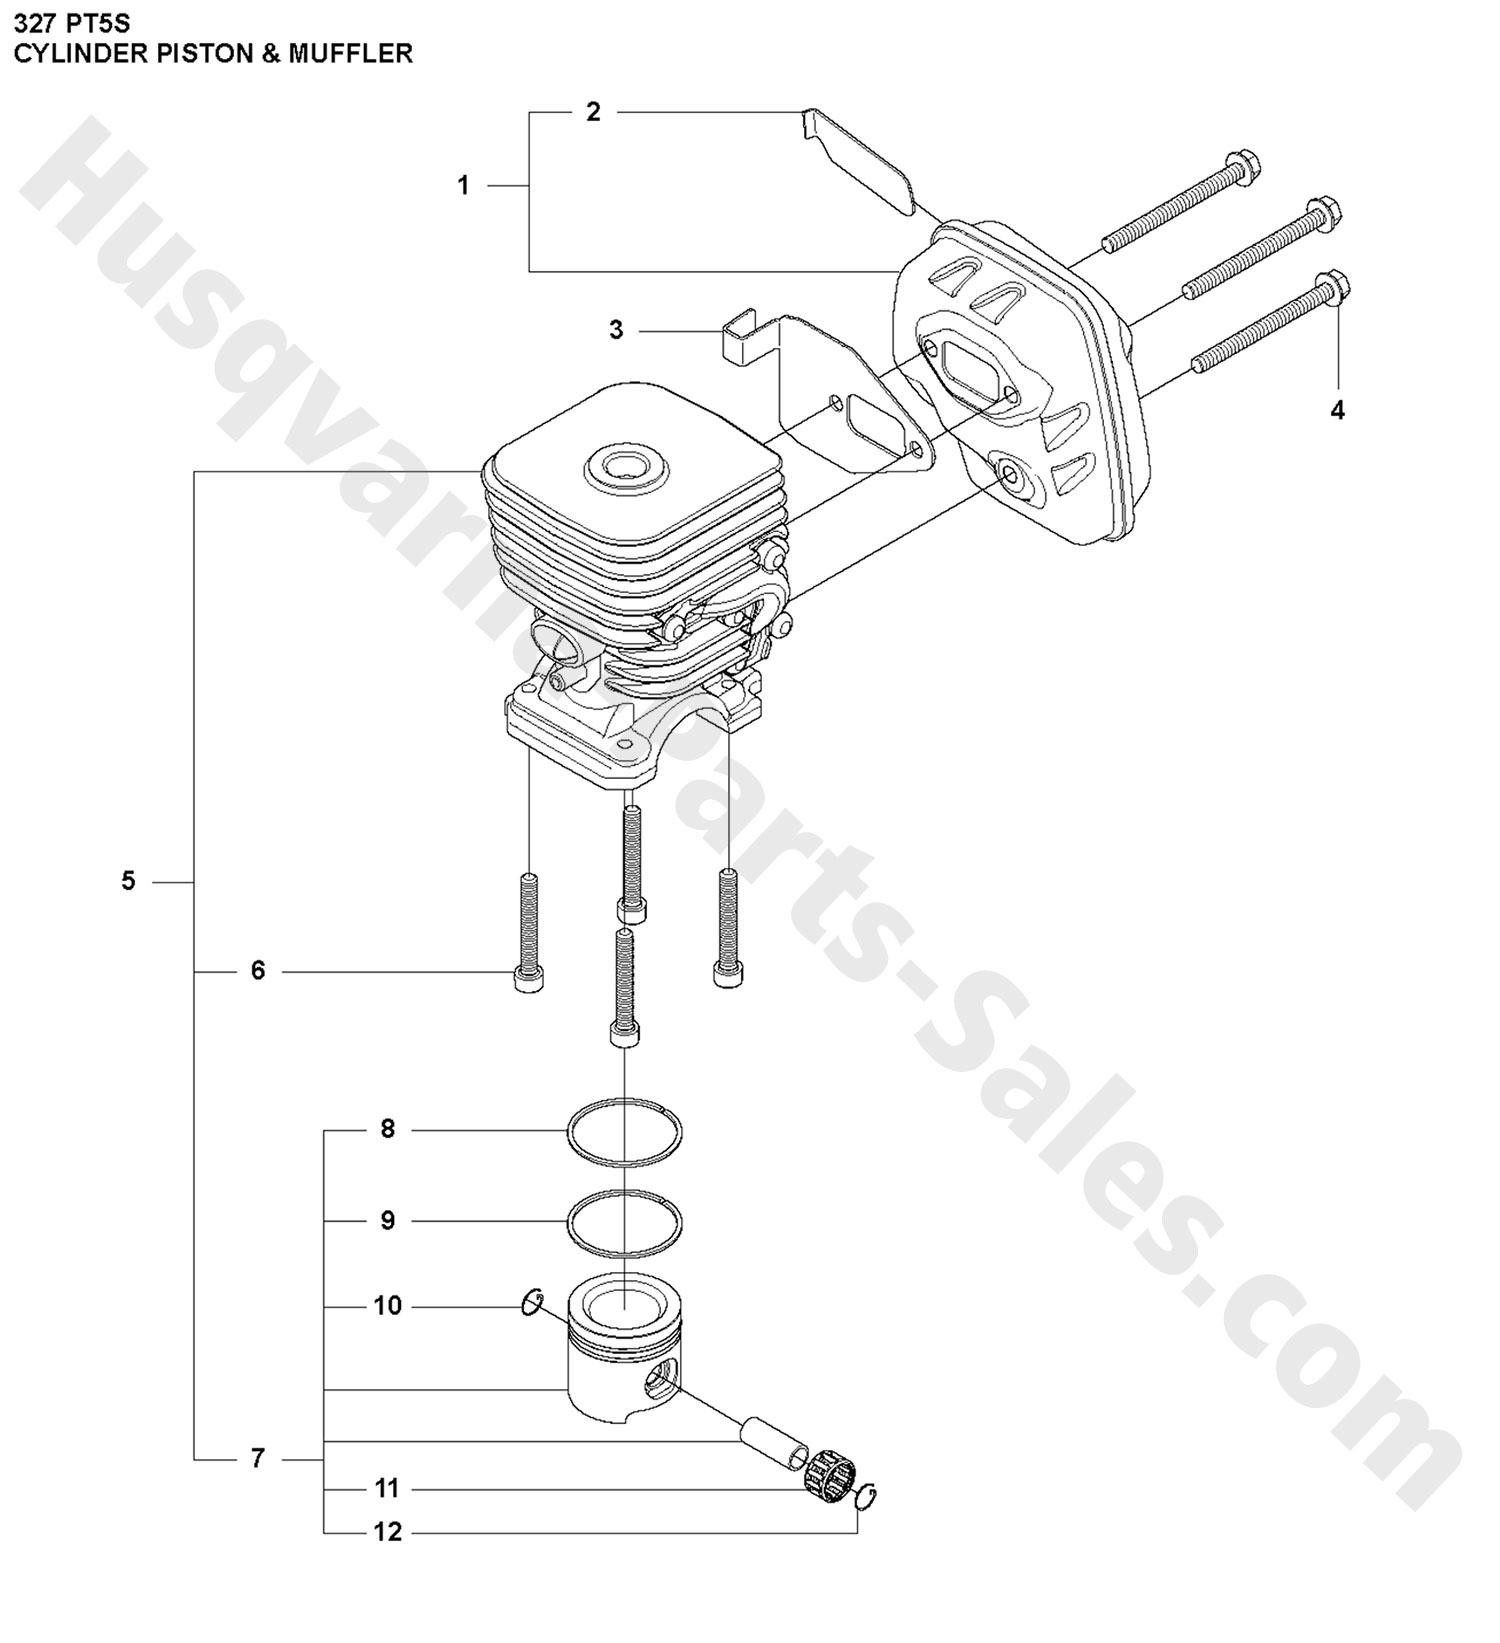 327 Chevy Blower Pistons: 327PT5S Husqvarna Pole Saw Cylinder, Piston & Muffler Parts